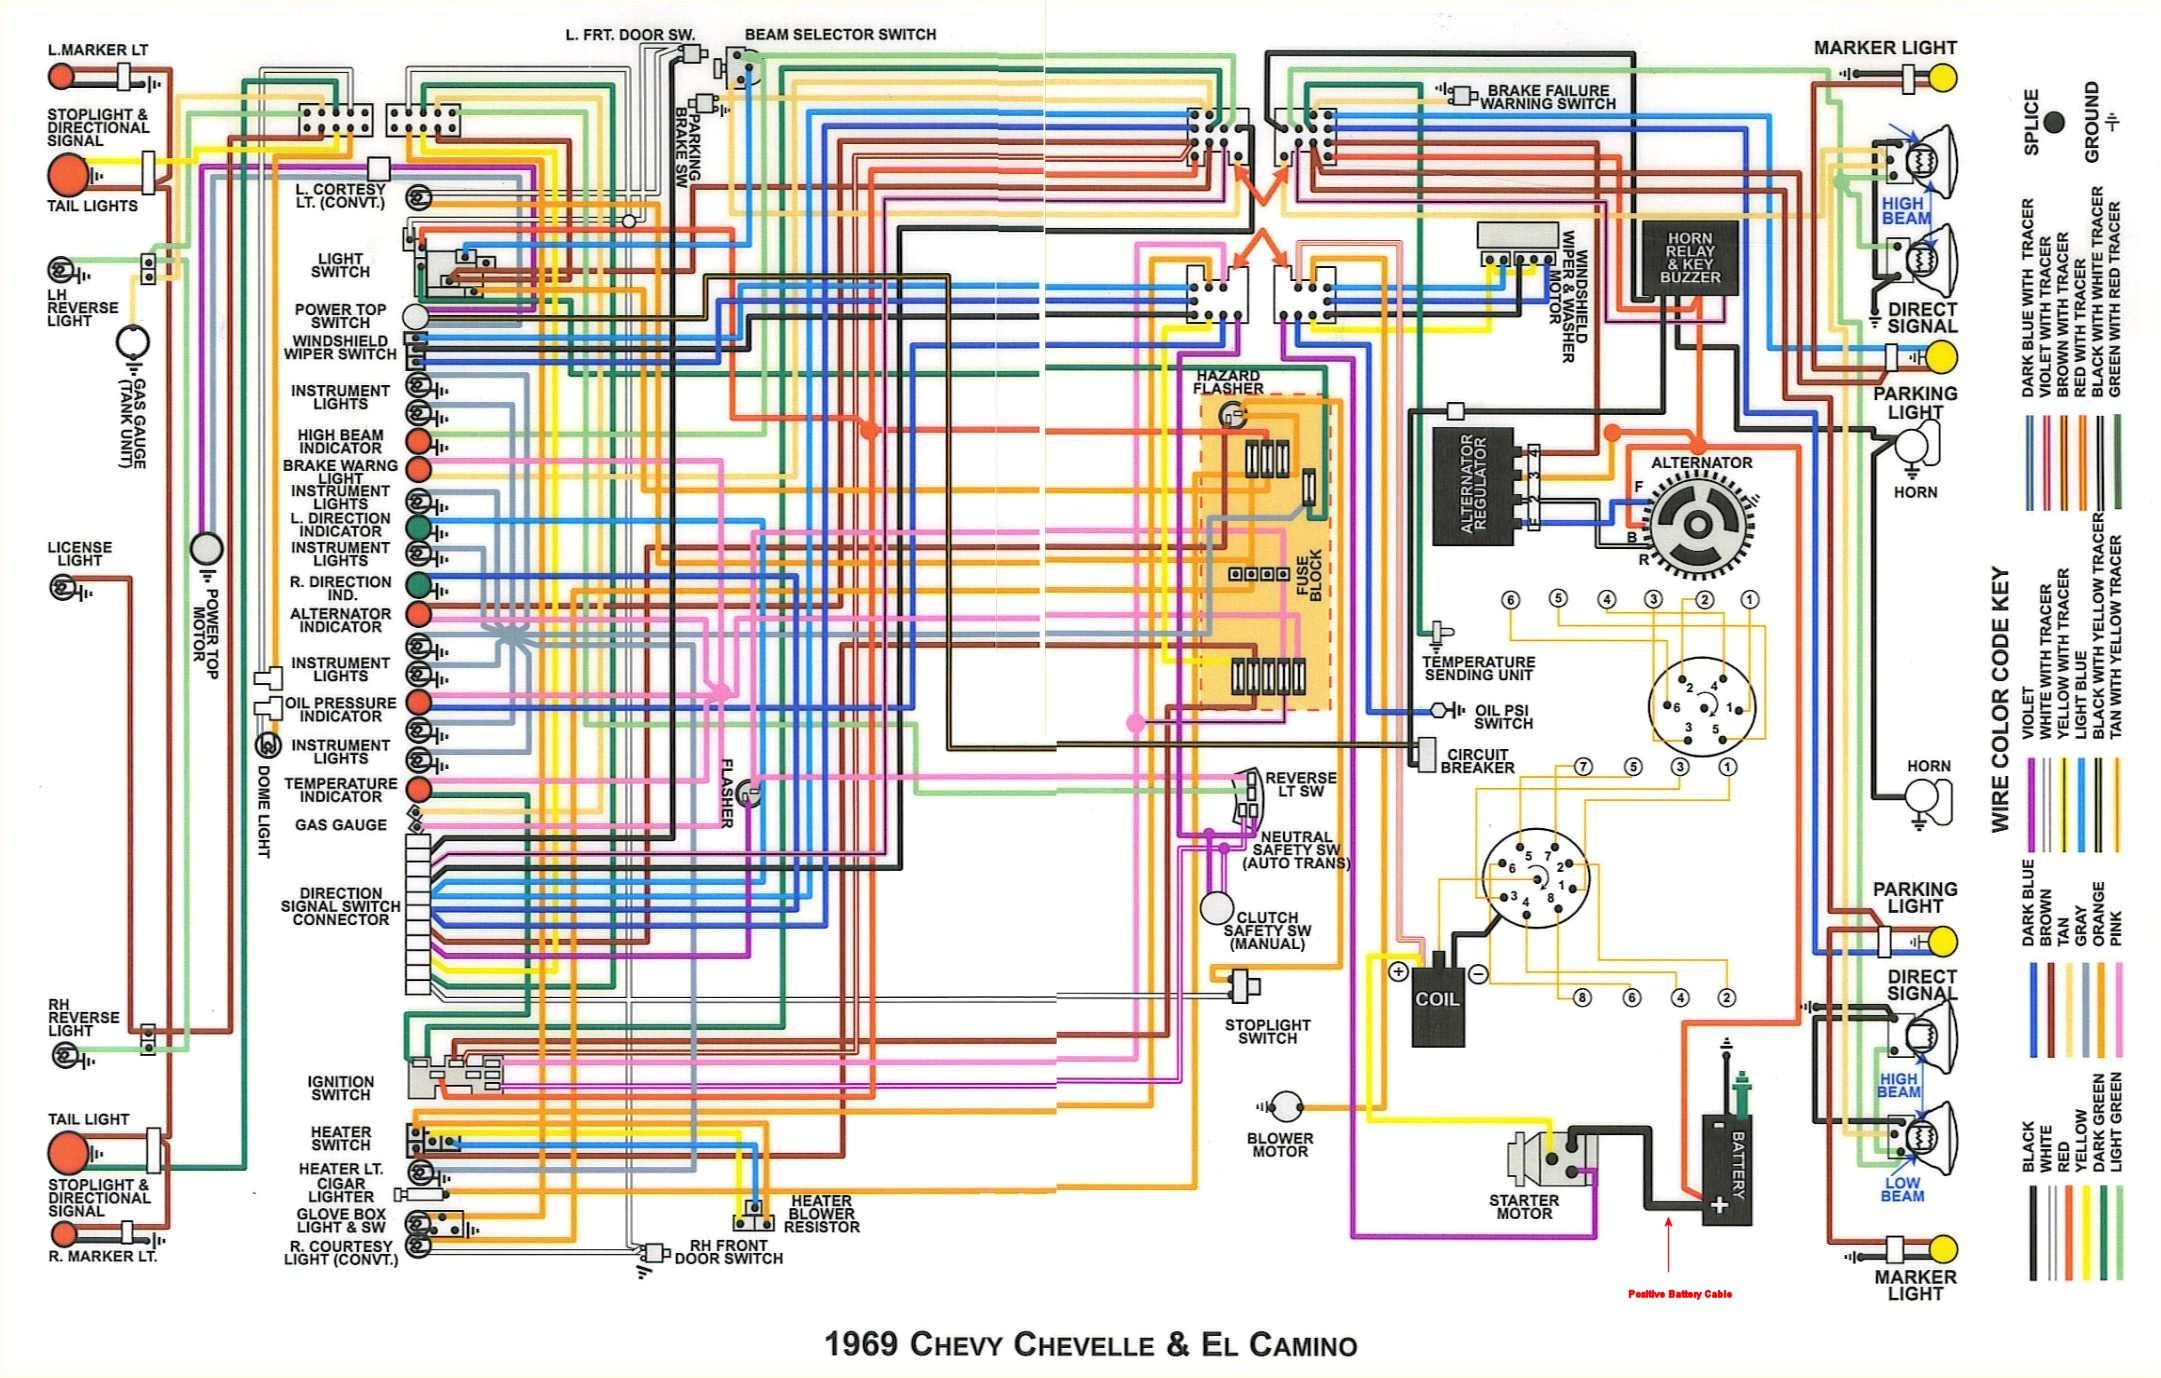 1969 malibu wiring diagrams data diagram schematic wiring diagram 1969 malibu